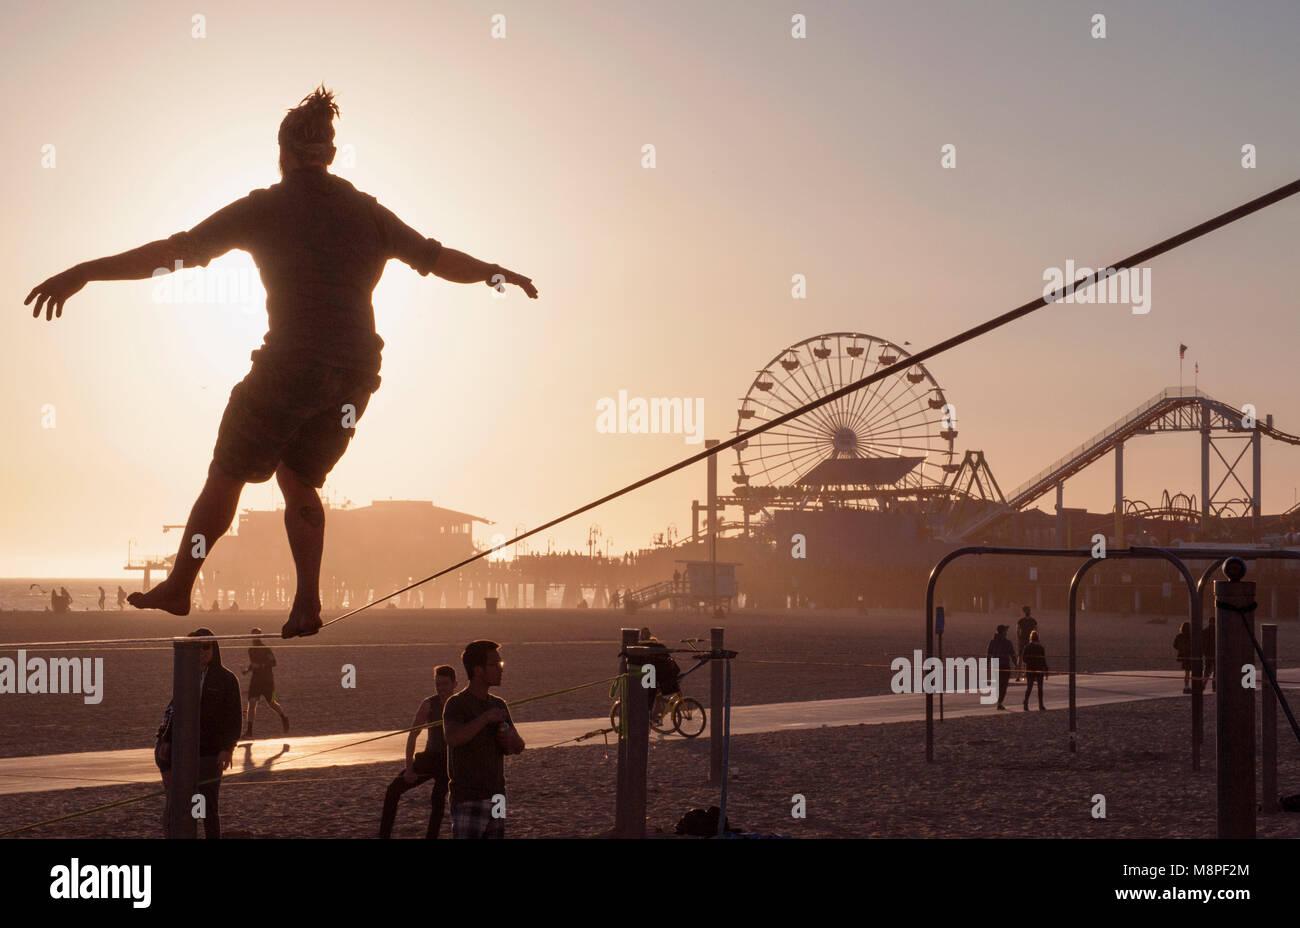 Seil Praxis am Strand in der Nähe der Santa Monica Pier, Los Angeles, CA Stockbild